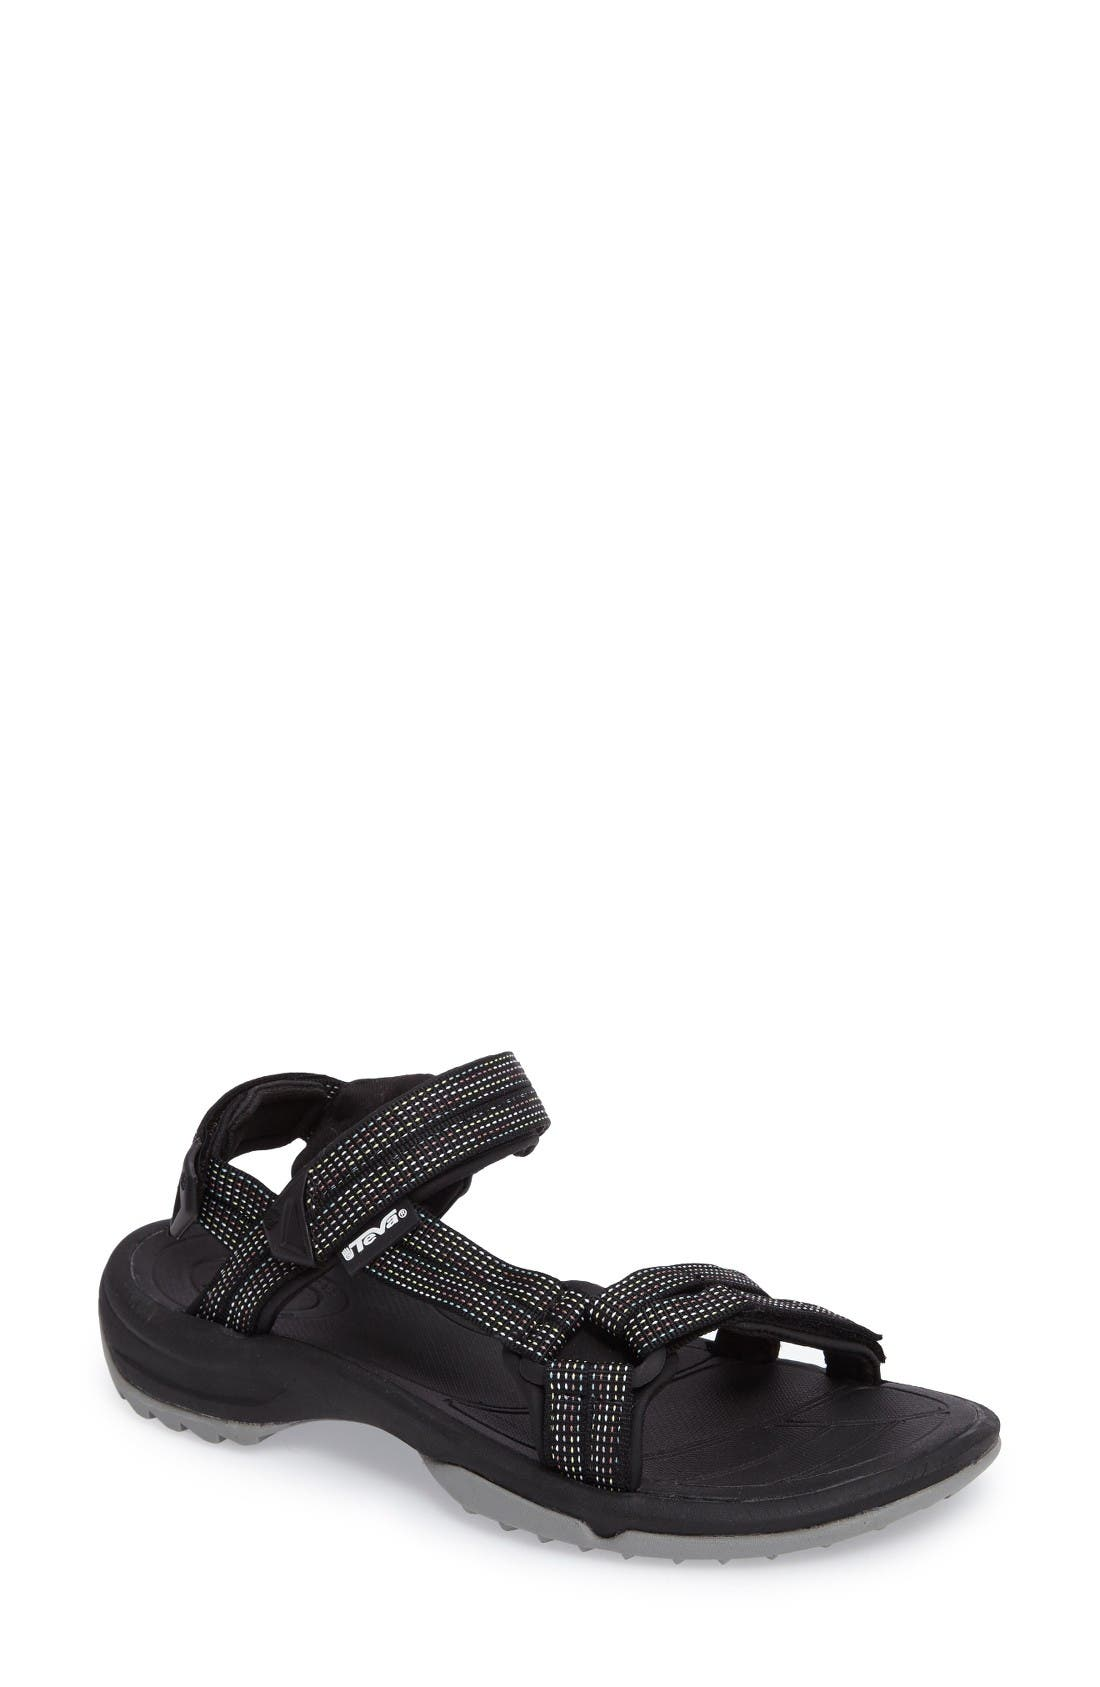 TEVA Terra Fi Lite Water-Ready Sandal